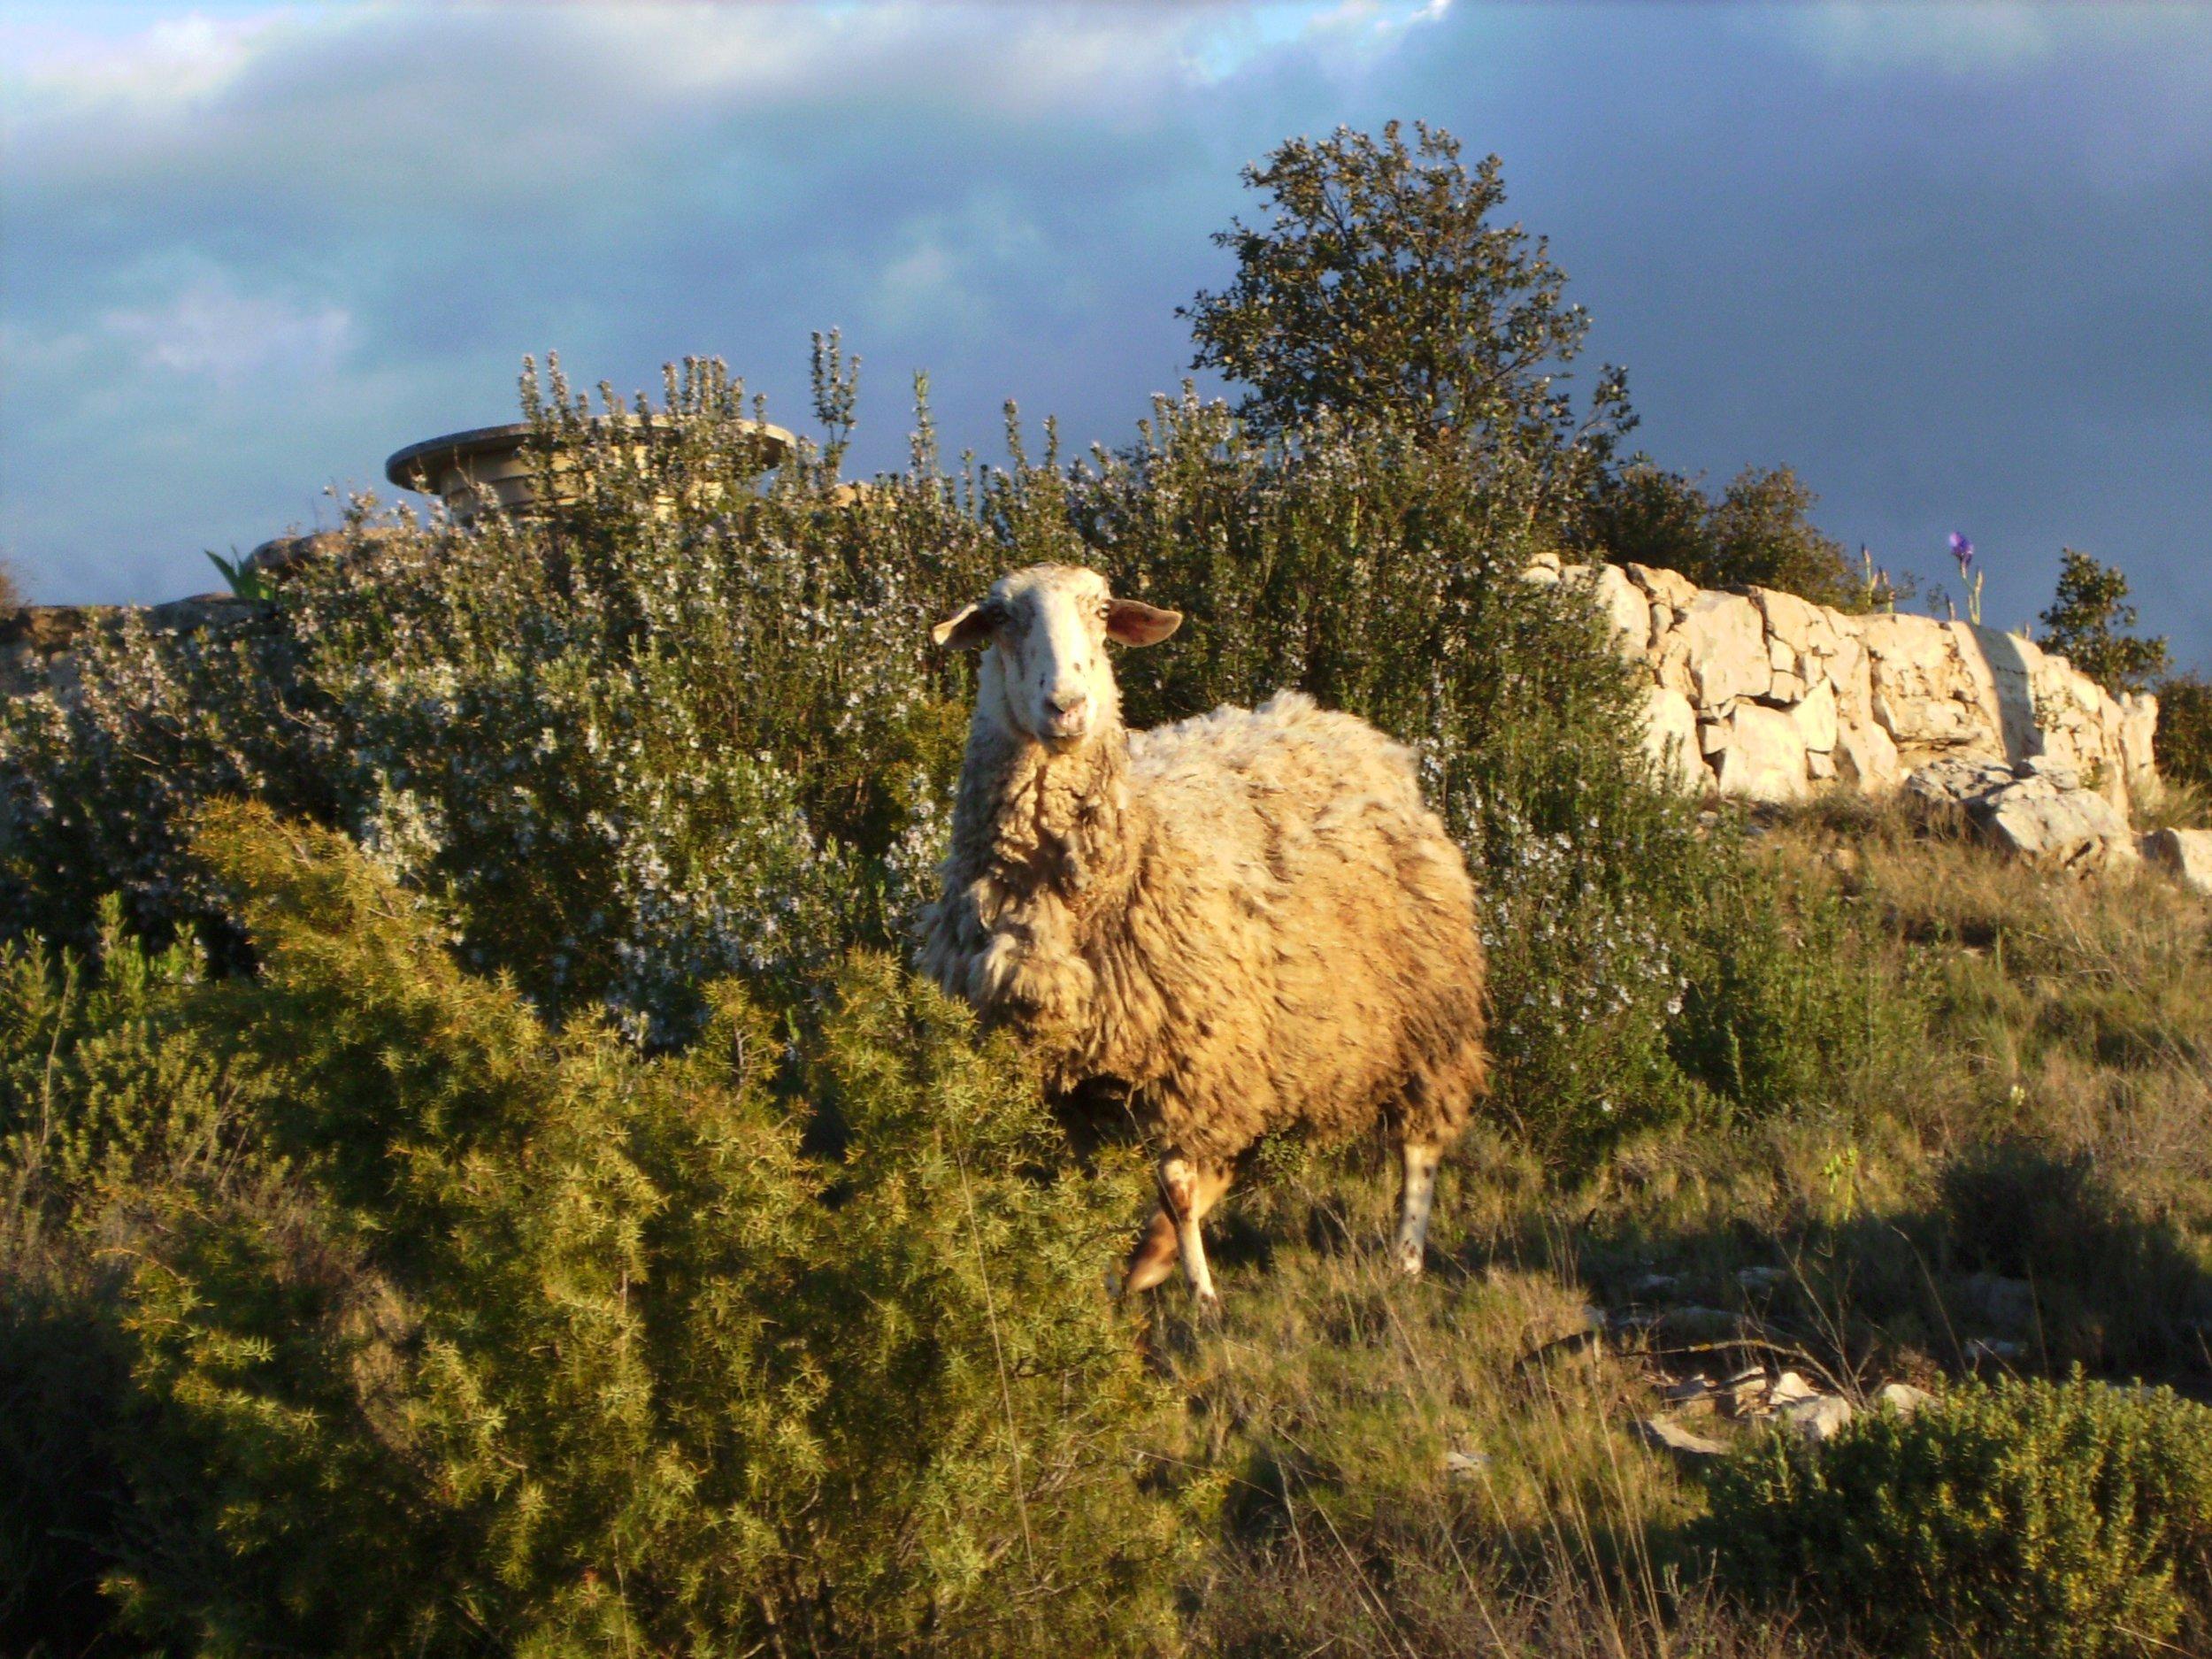 The_lost_sheep image.jpg